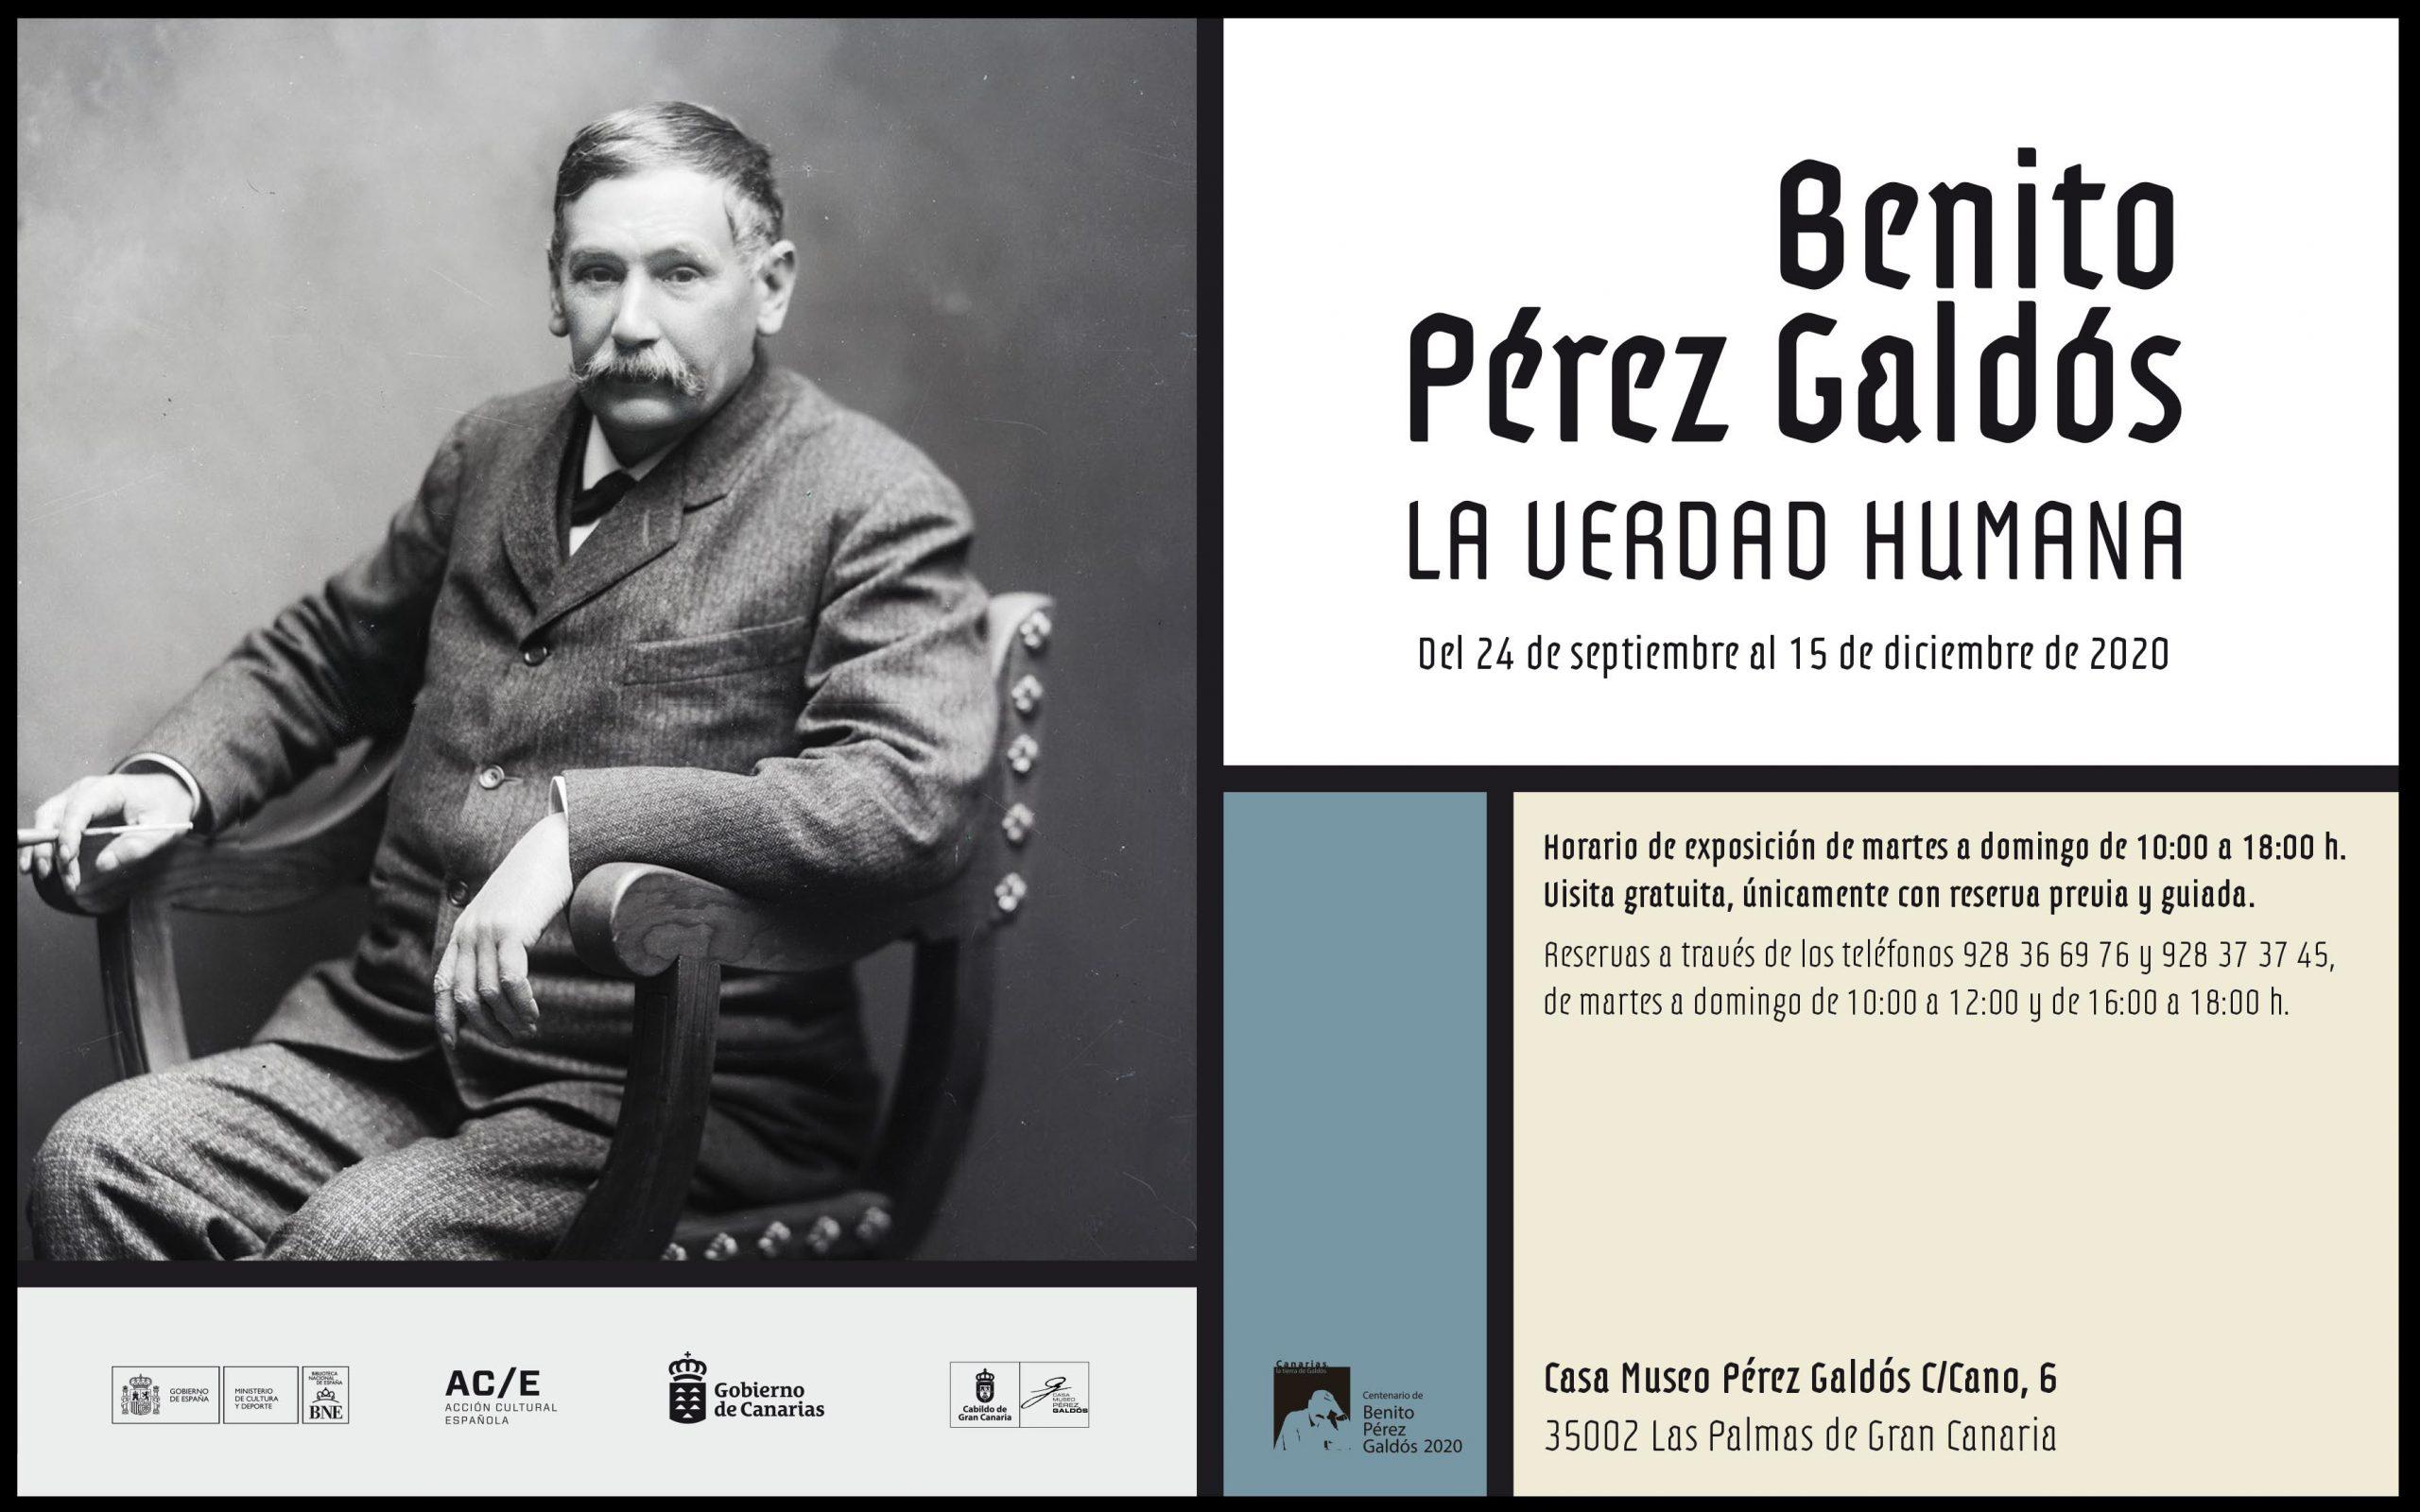 Exposición 'Benito Pérez Galdós. La verdad humana'. 24 sept-15 dic 2020. Casa-Museo Pérez Galdós